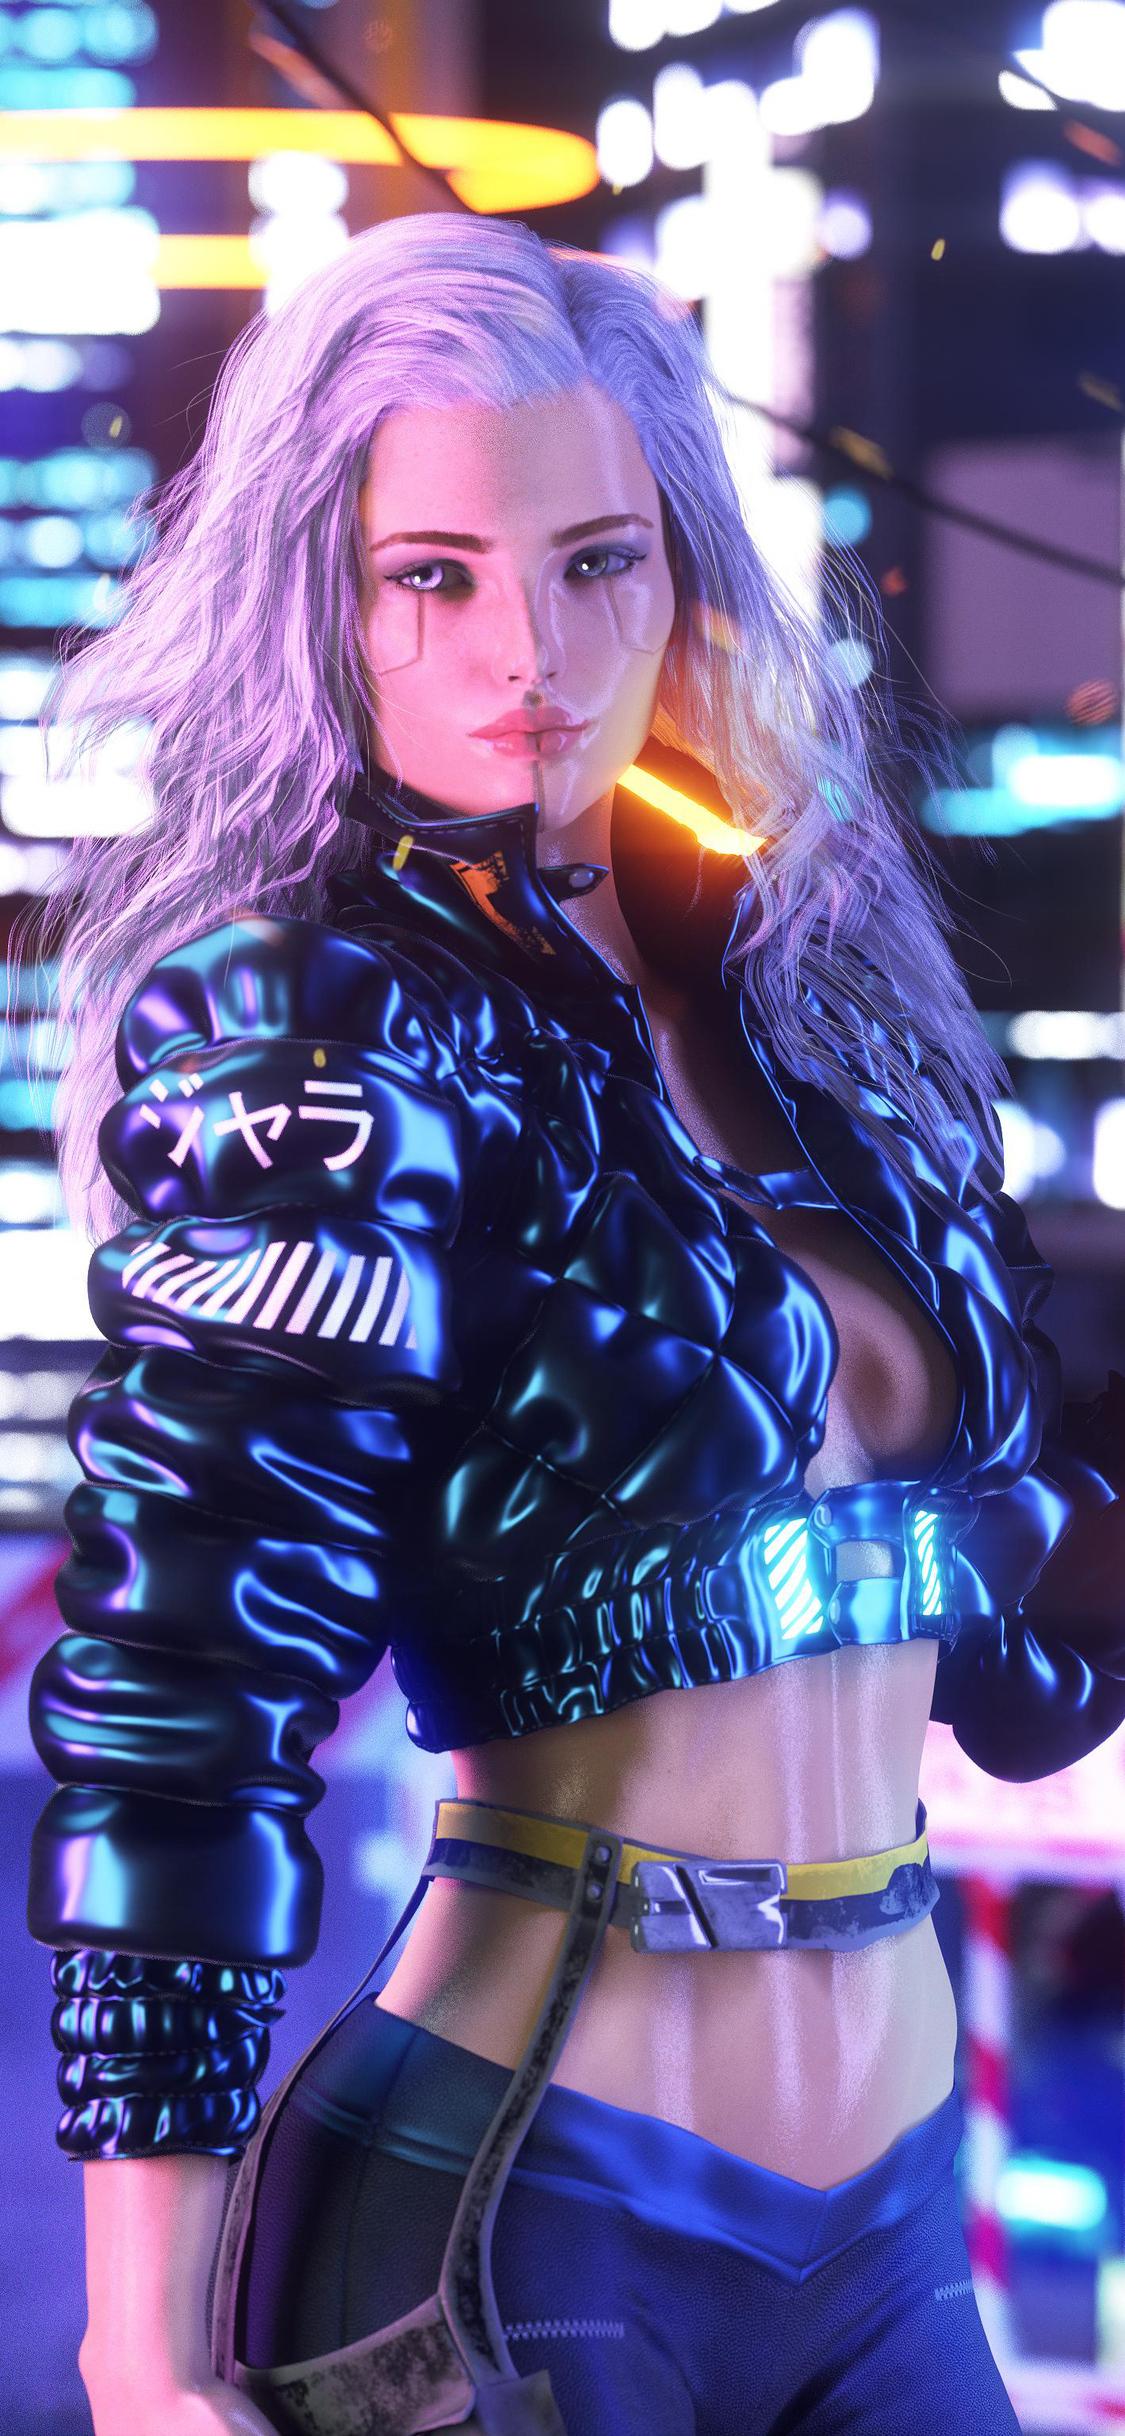 1125x2436 Cyberpunk Girl With Gun Artwork Iphone XS,Iphone ...